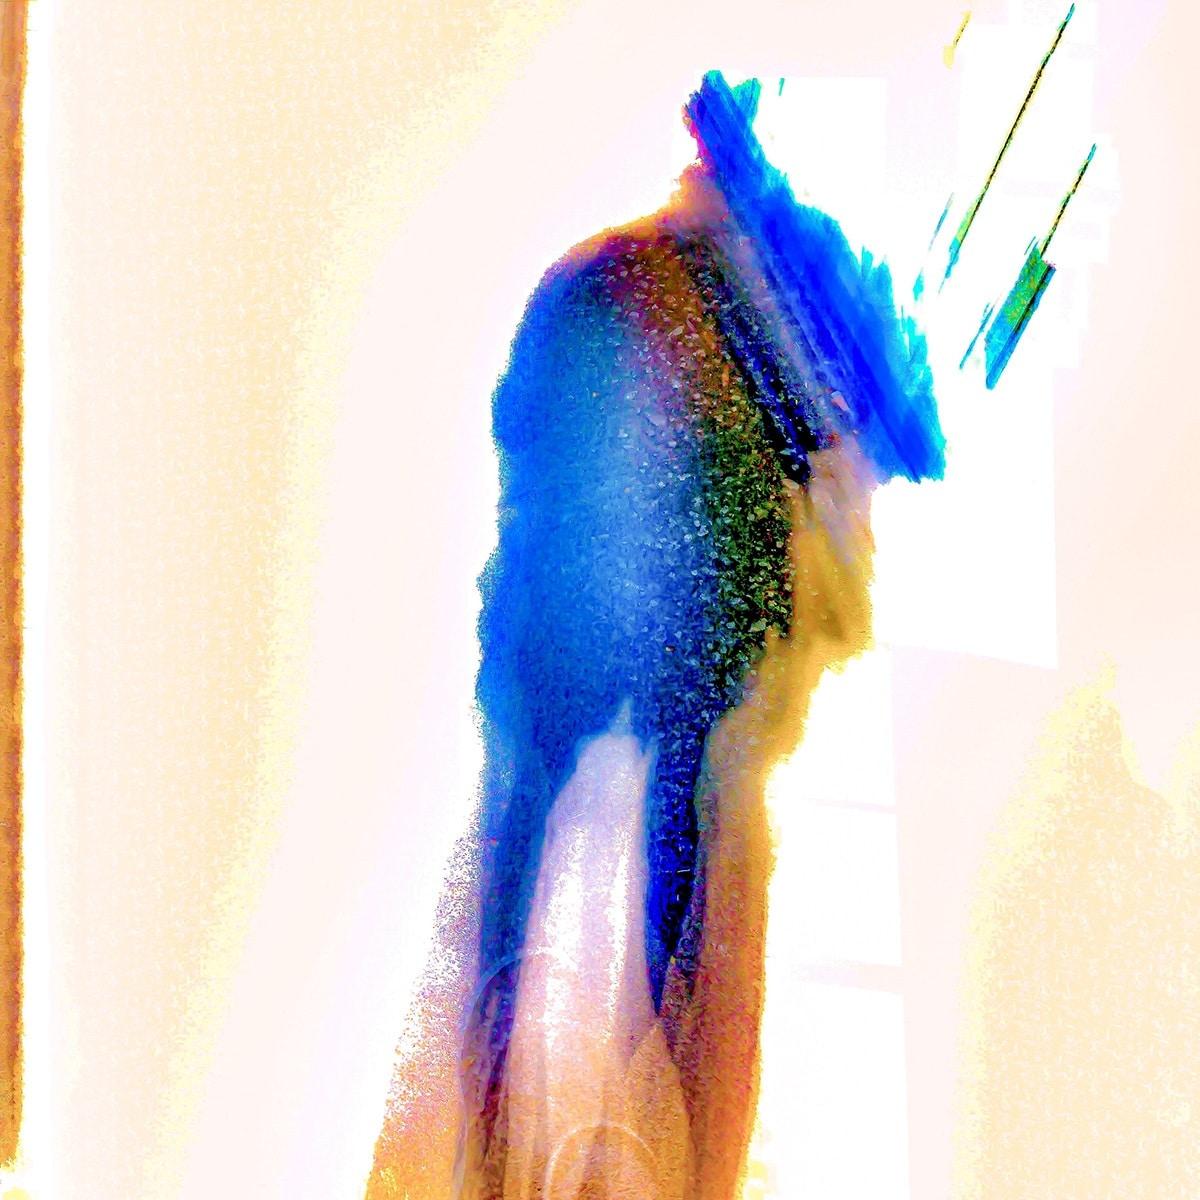 Shadow No. 02 // 30 x30, Fineart Print auf Photorag, 2018